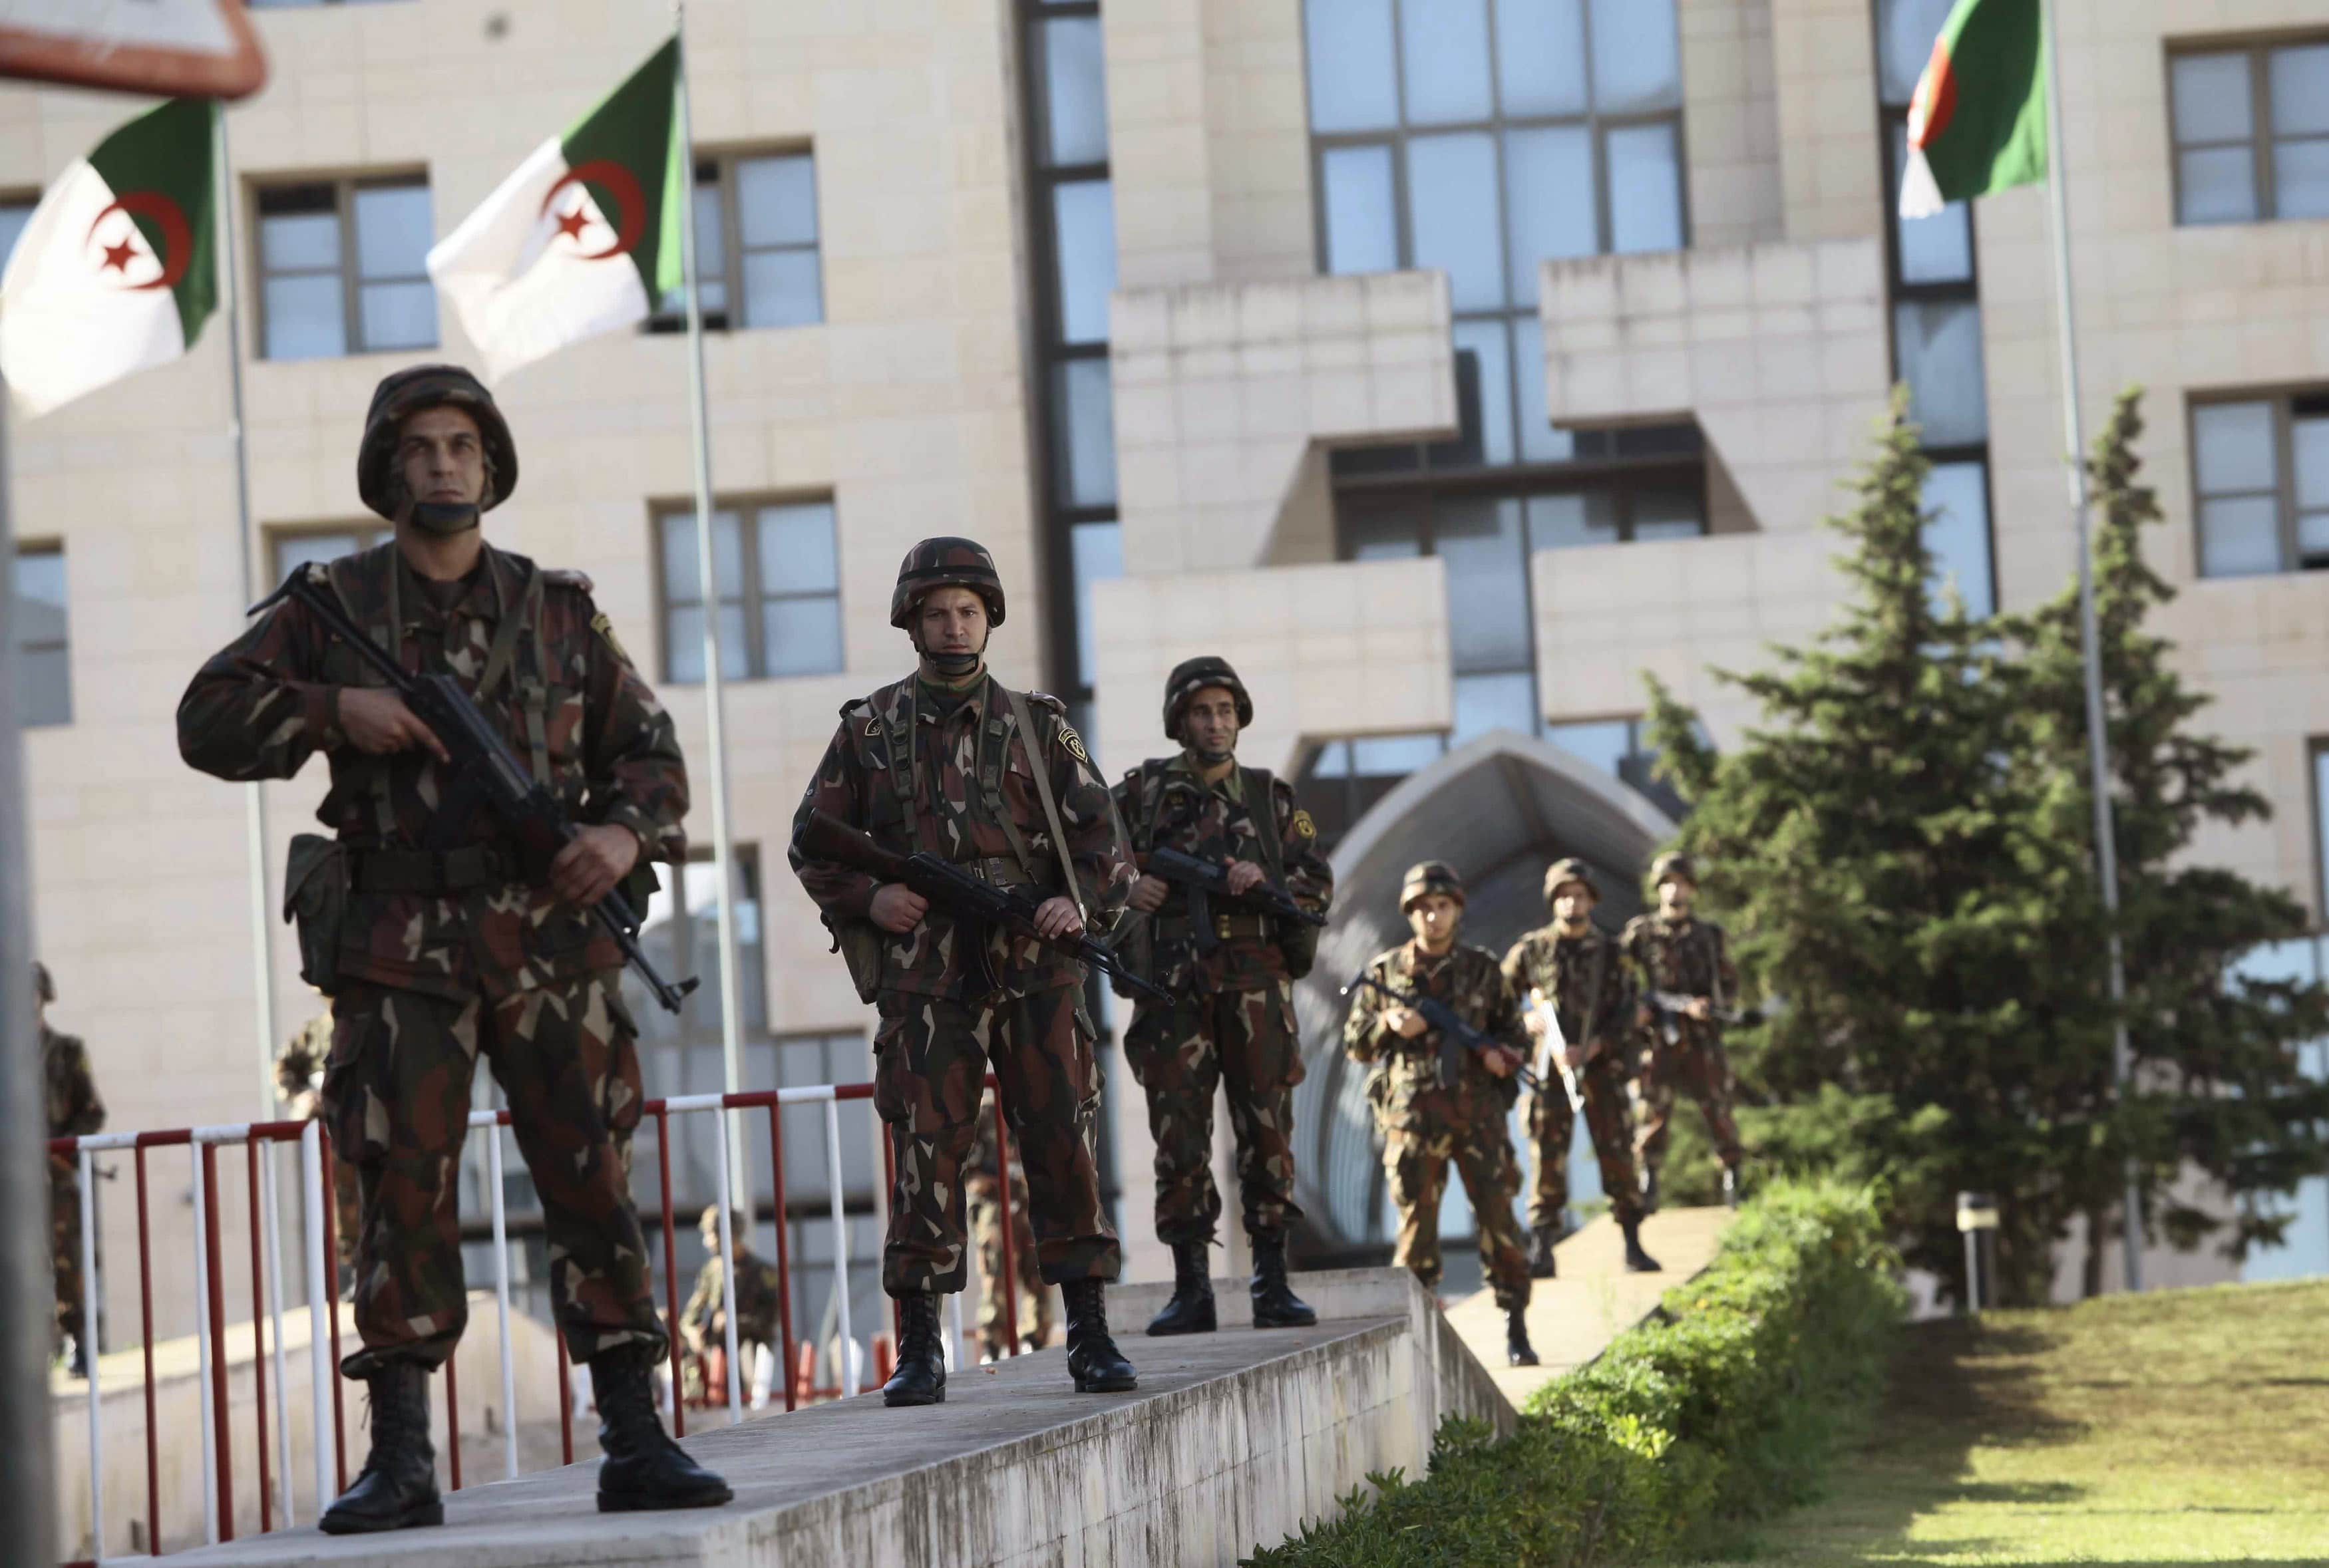 الحزب الحاكم بالجزائر